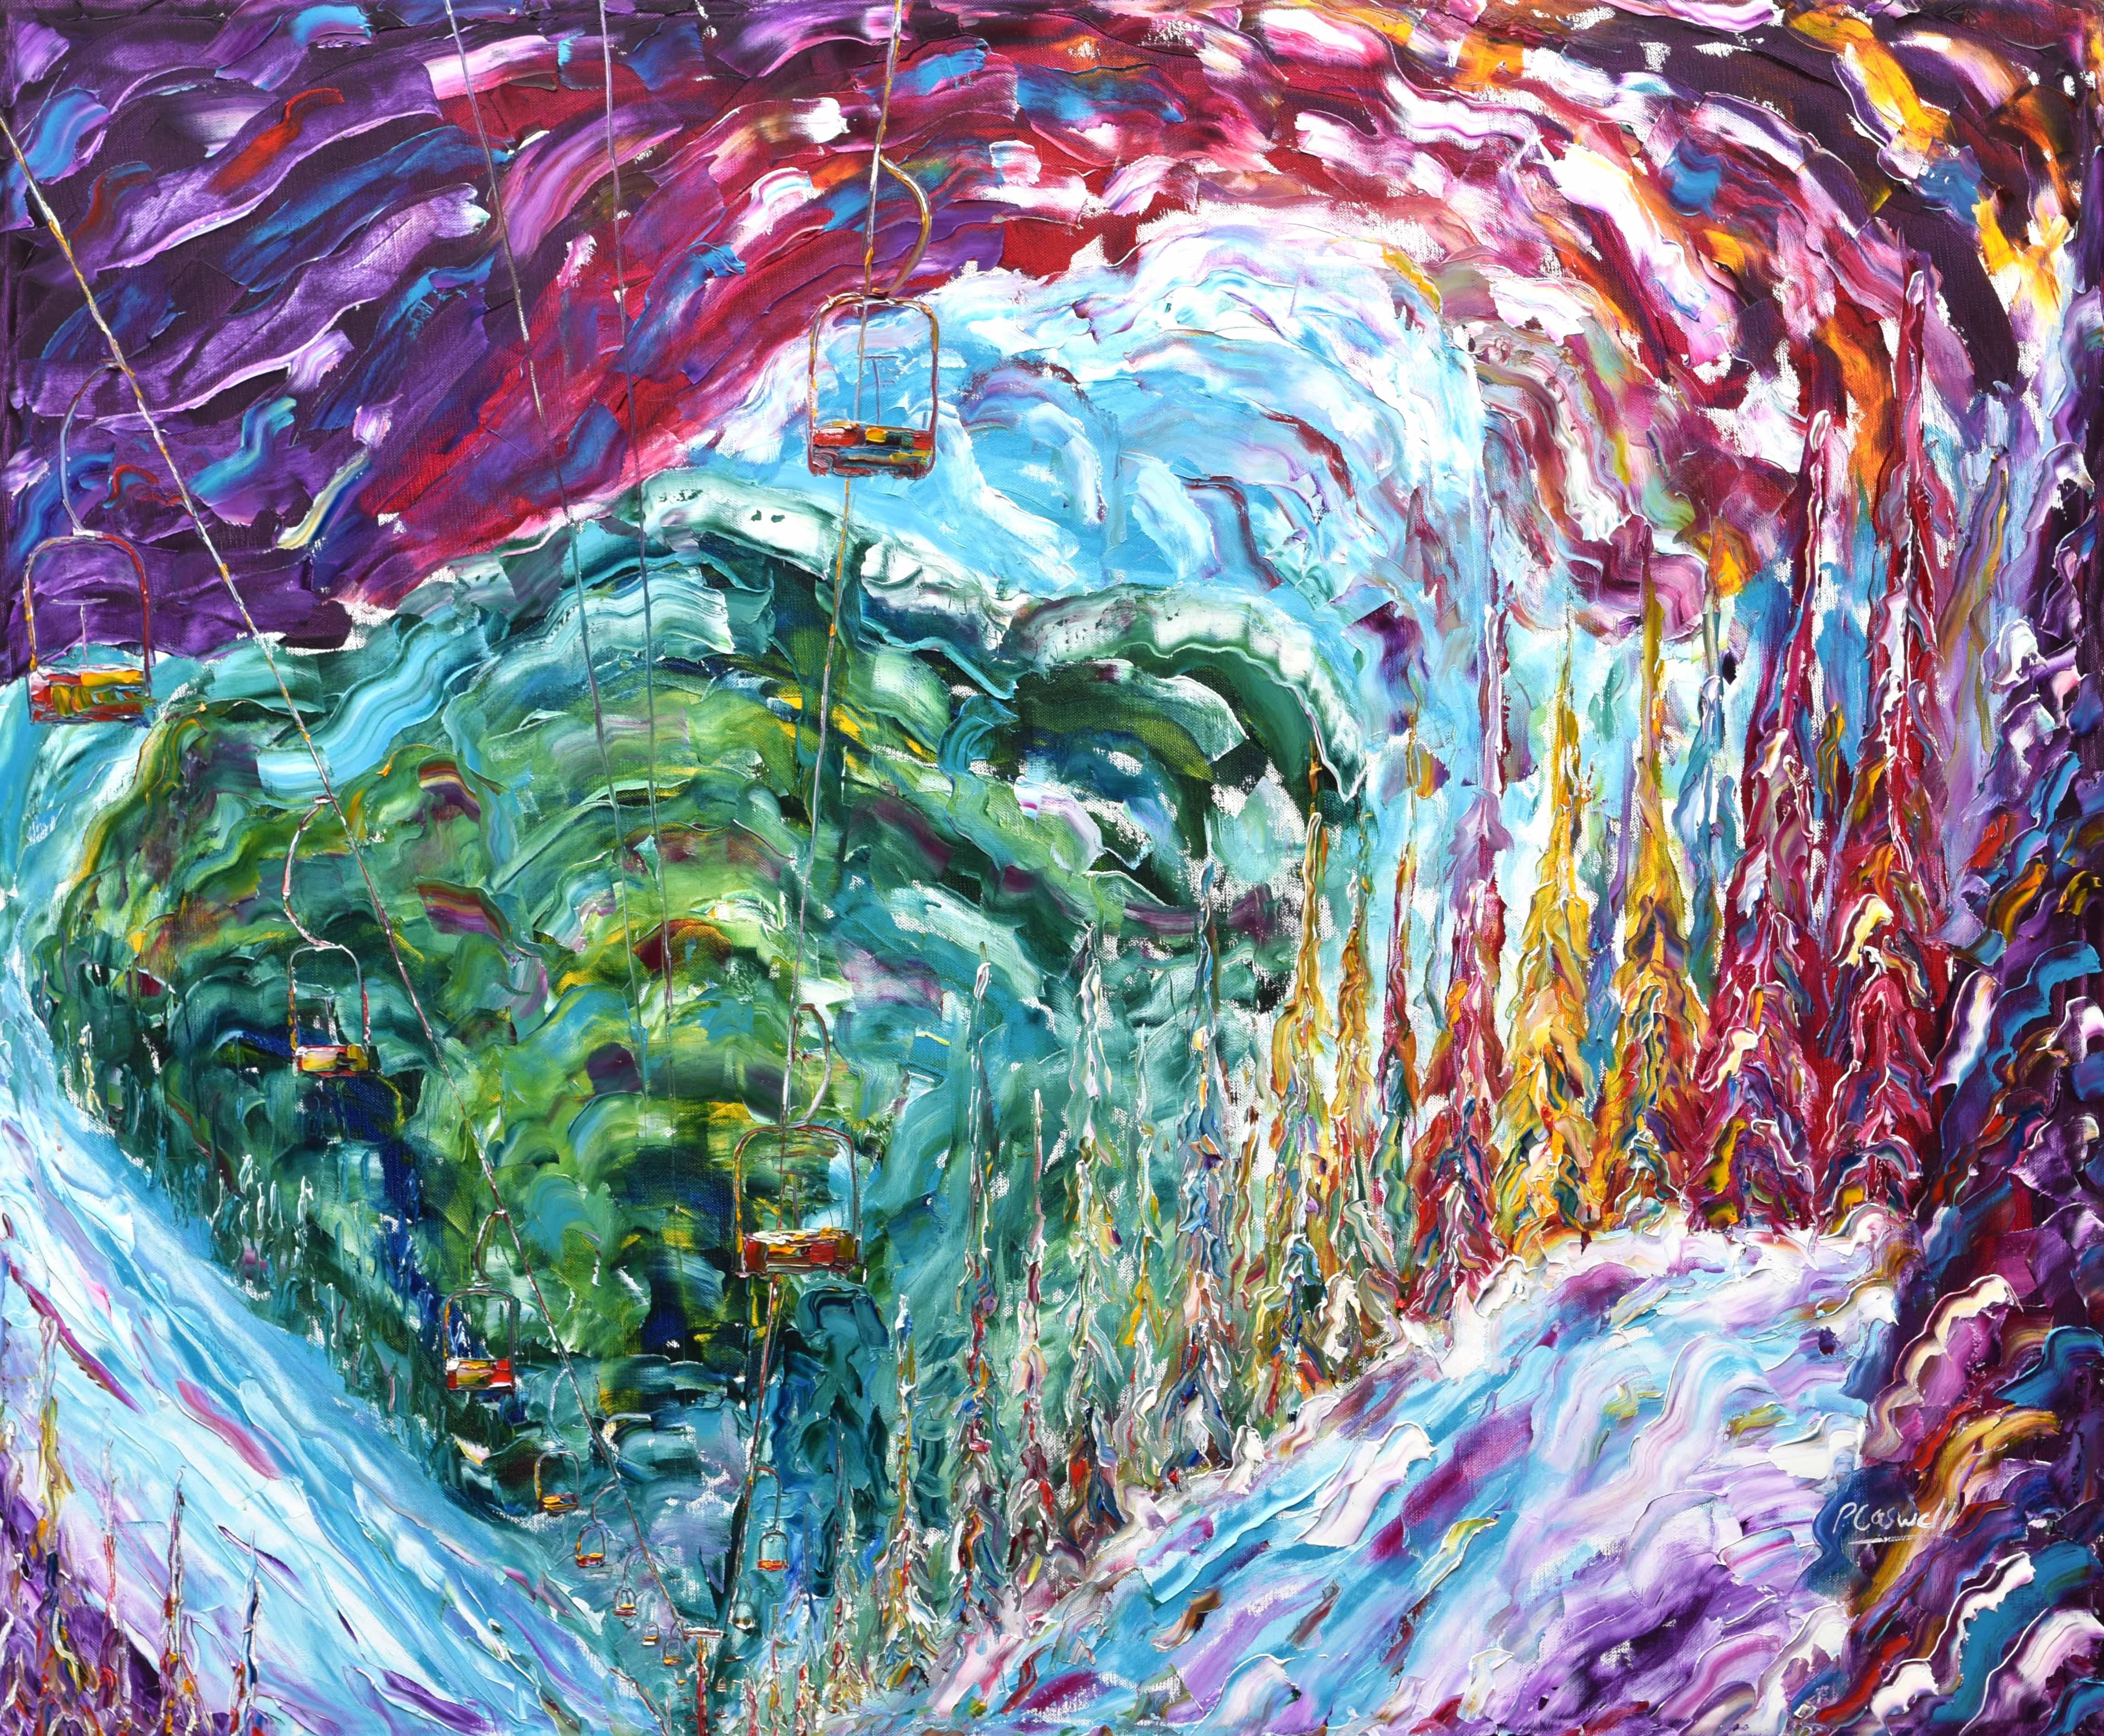 Siiviez Verbier Four Valleys skiing snowboarding painting for sale